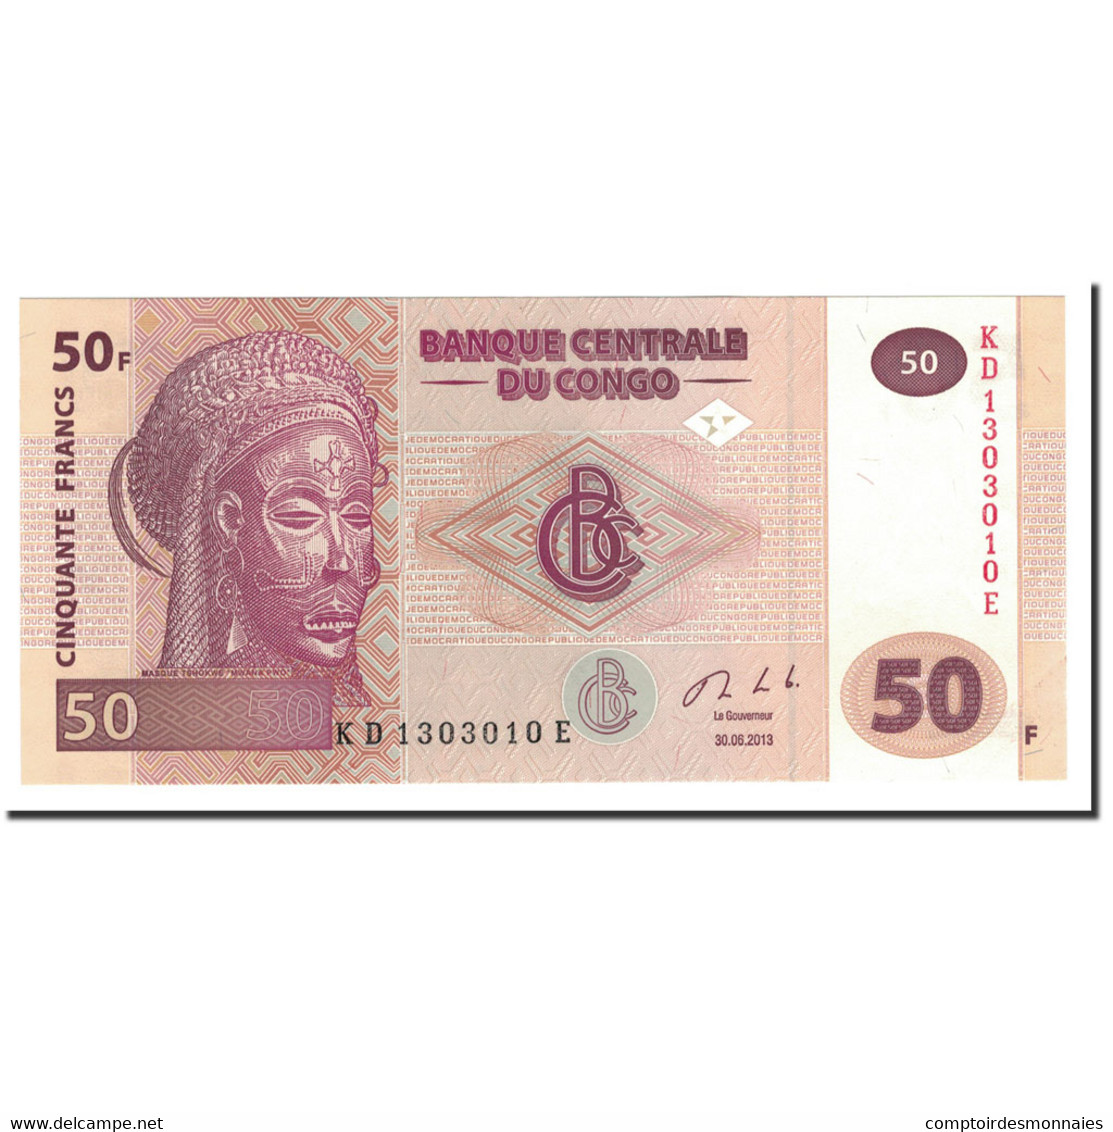 Congo Democratic Republic, 50 Francs, 2013, 2013-06-30, NEUF - Congo